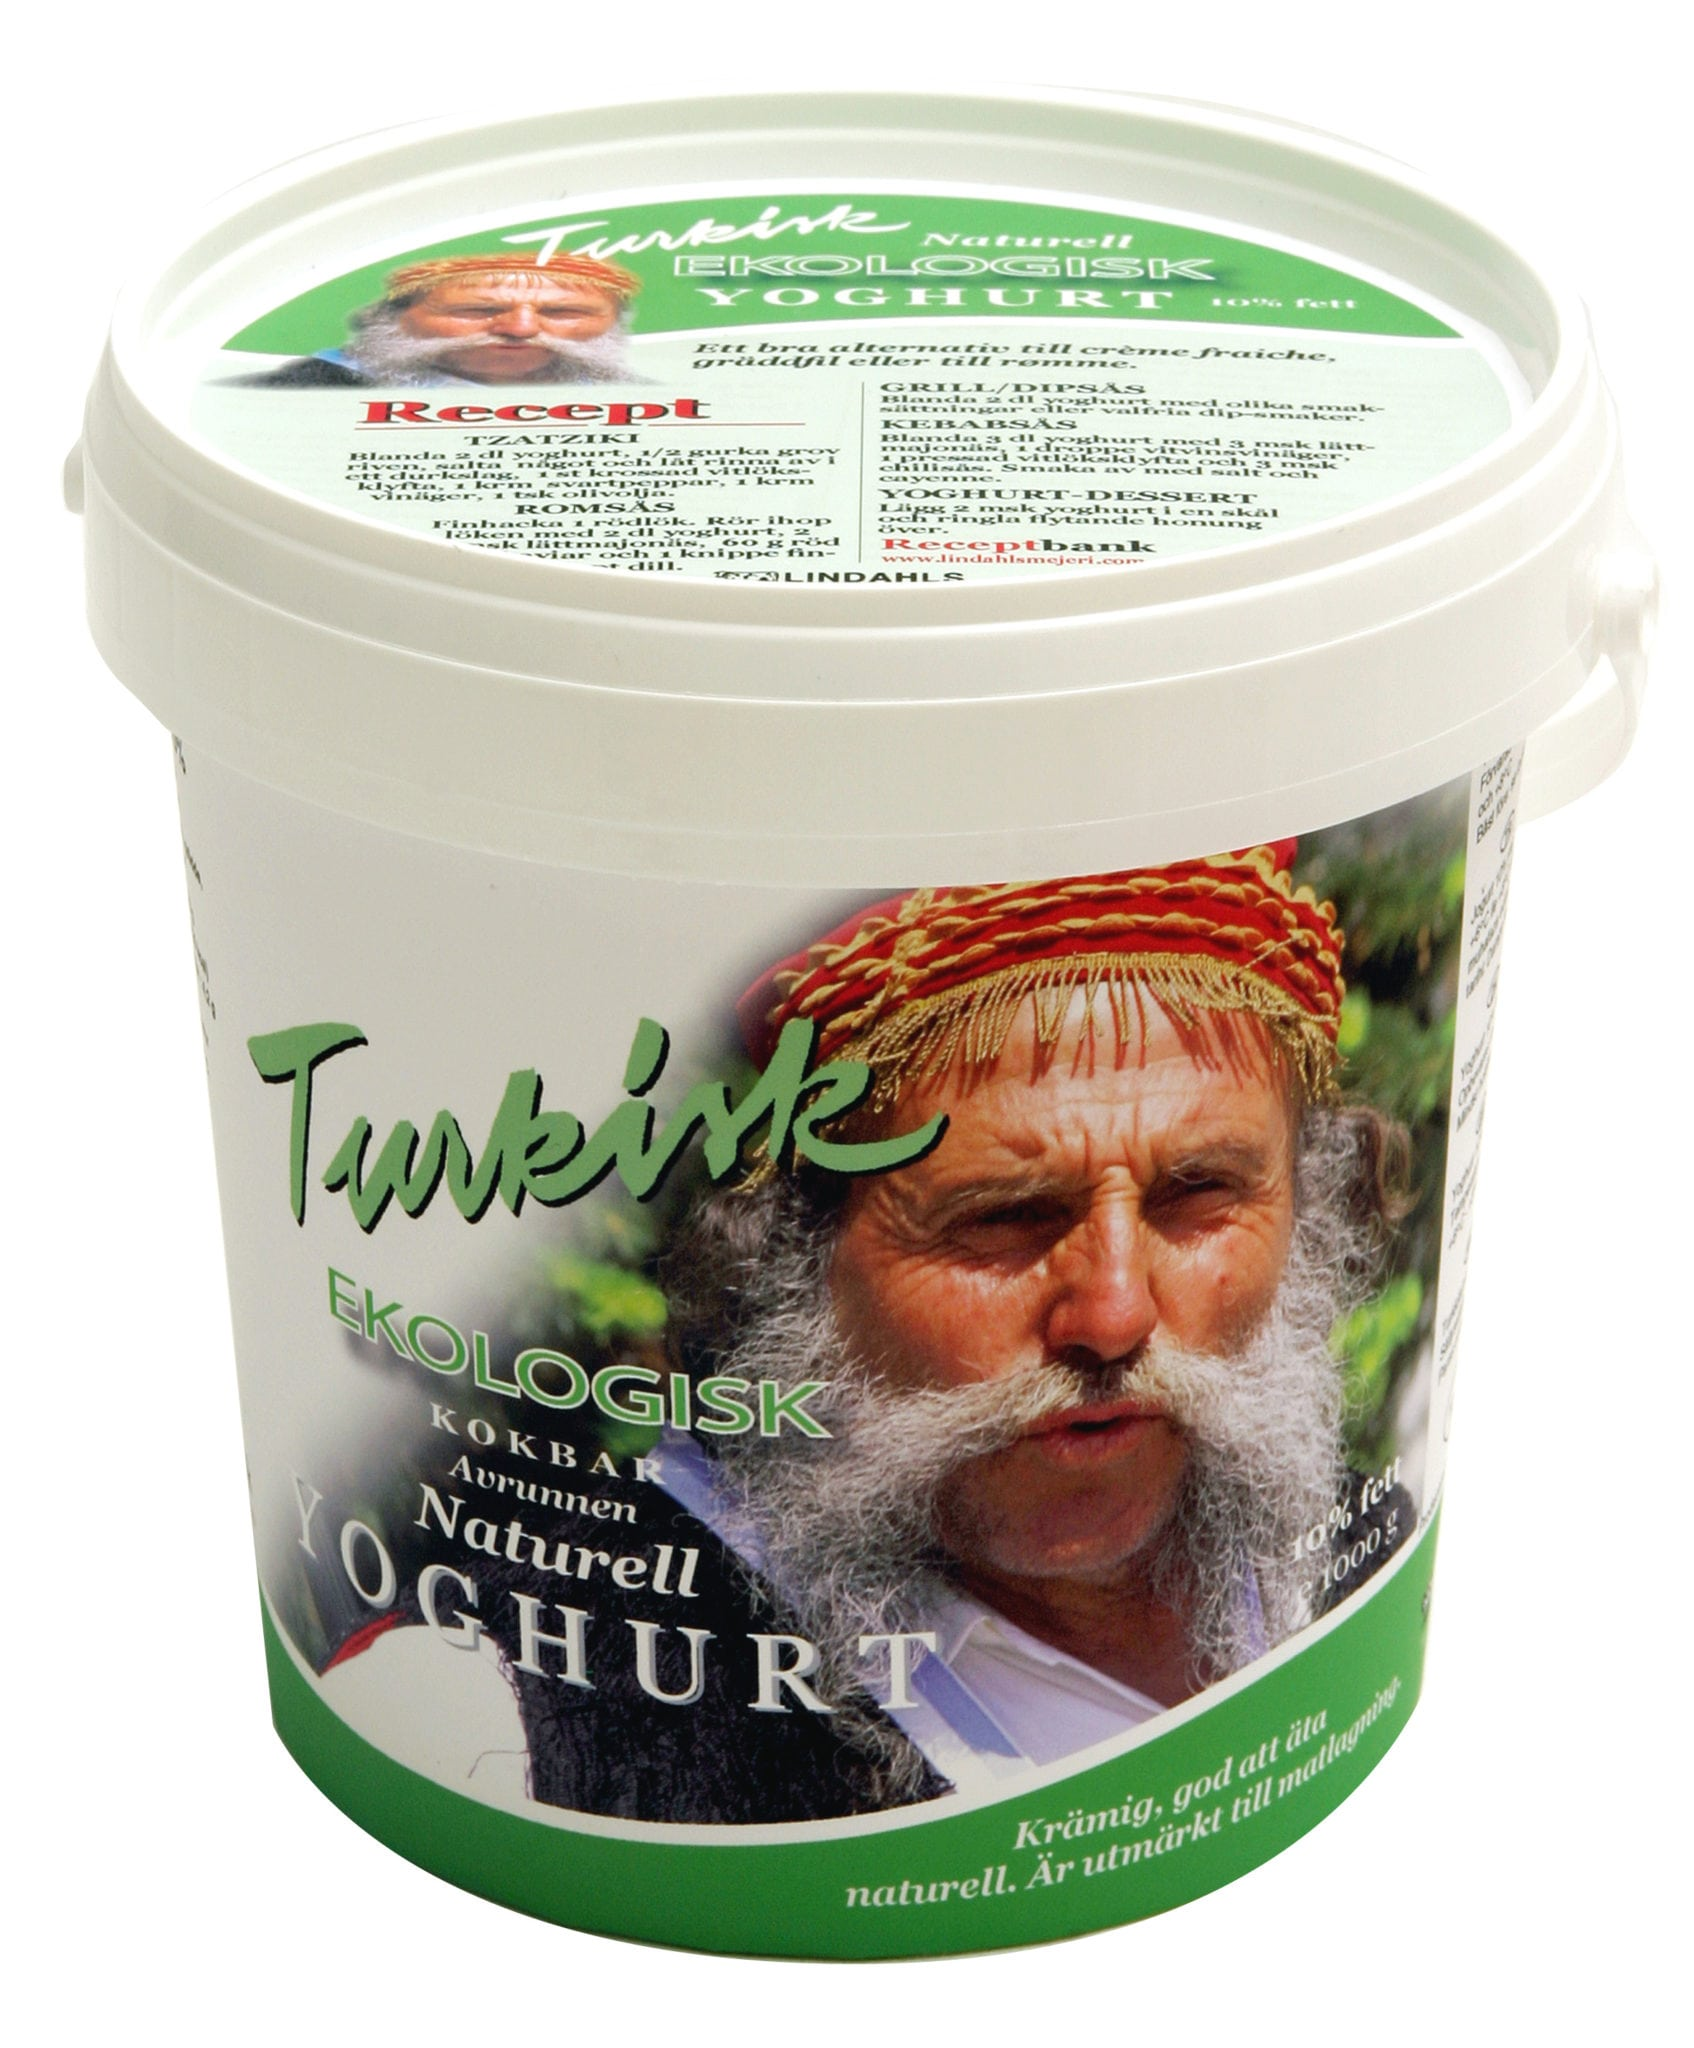 Turkisk favorit nu även utan laktos